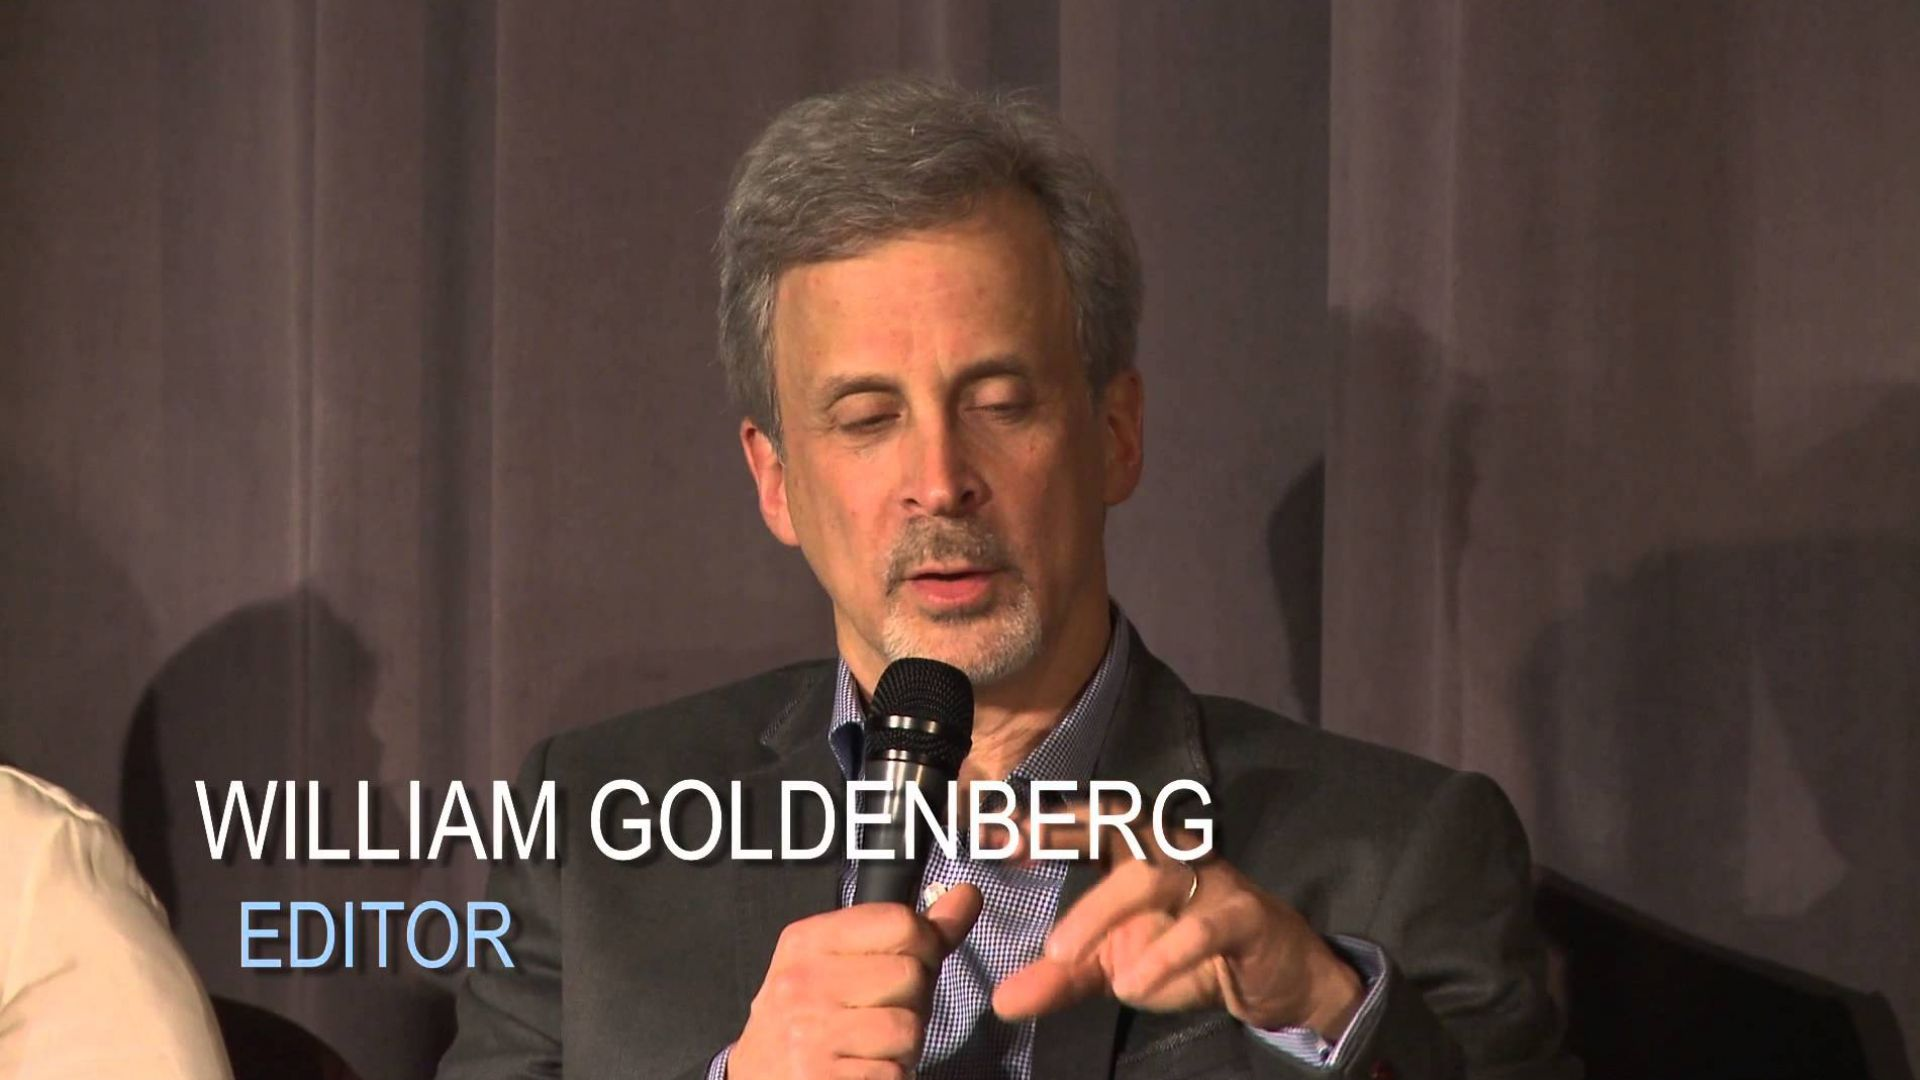 Oscar Nominated Editor William Goldenberg Talks About His De